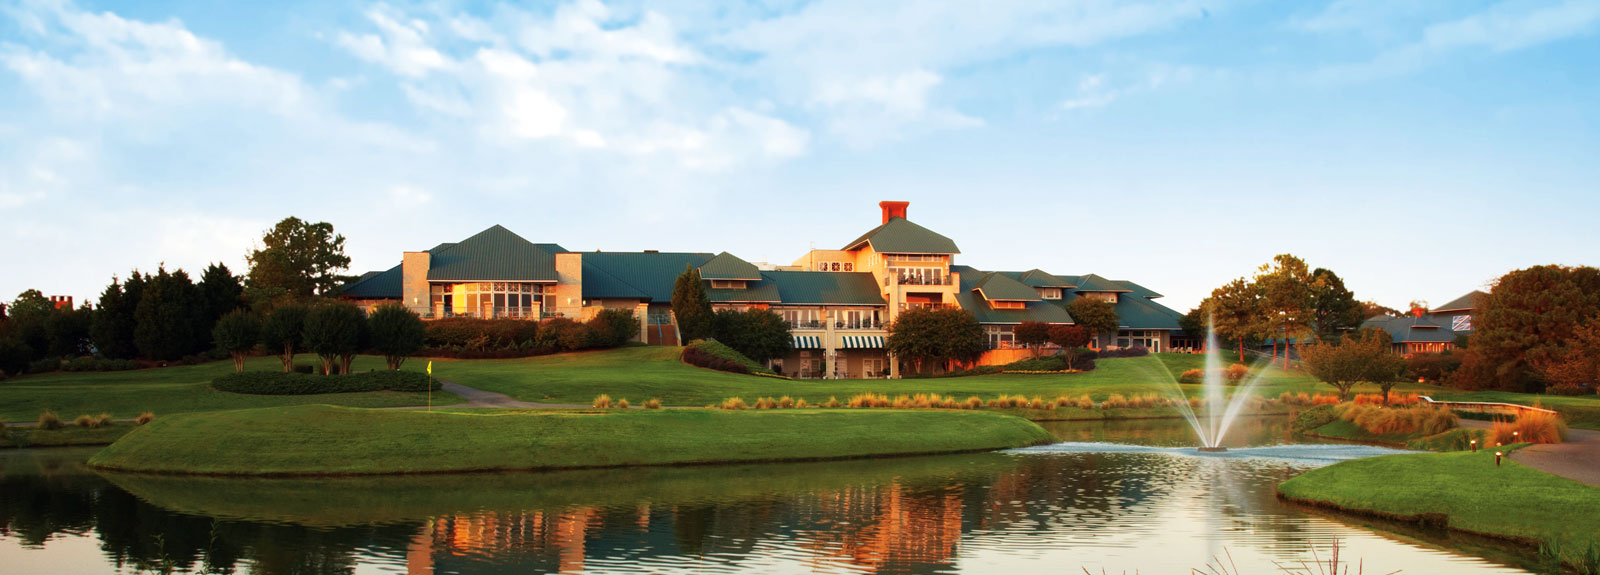 Williamsburg Spa Resort